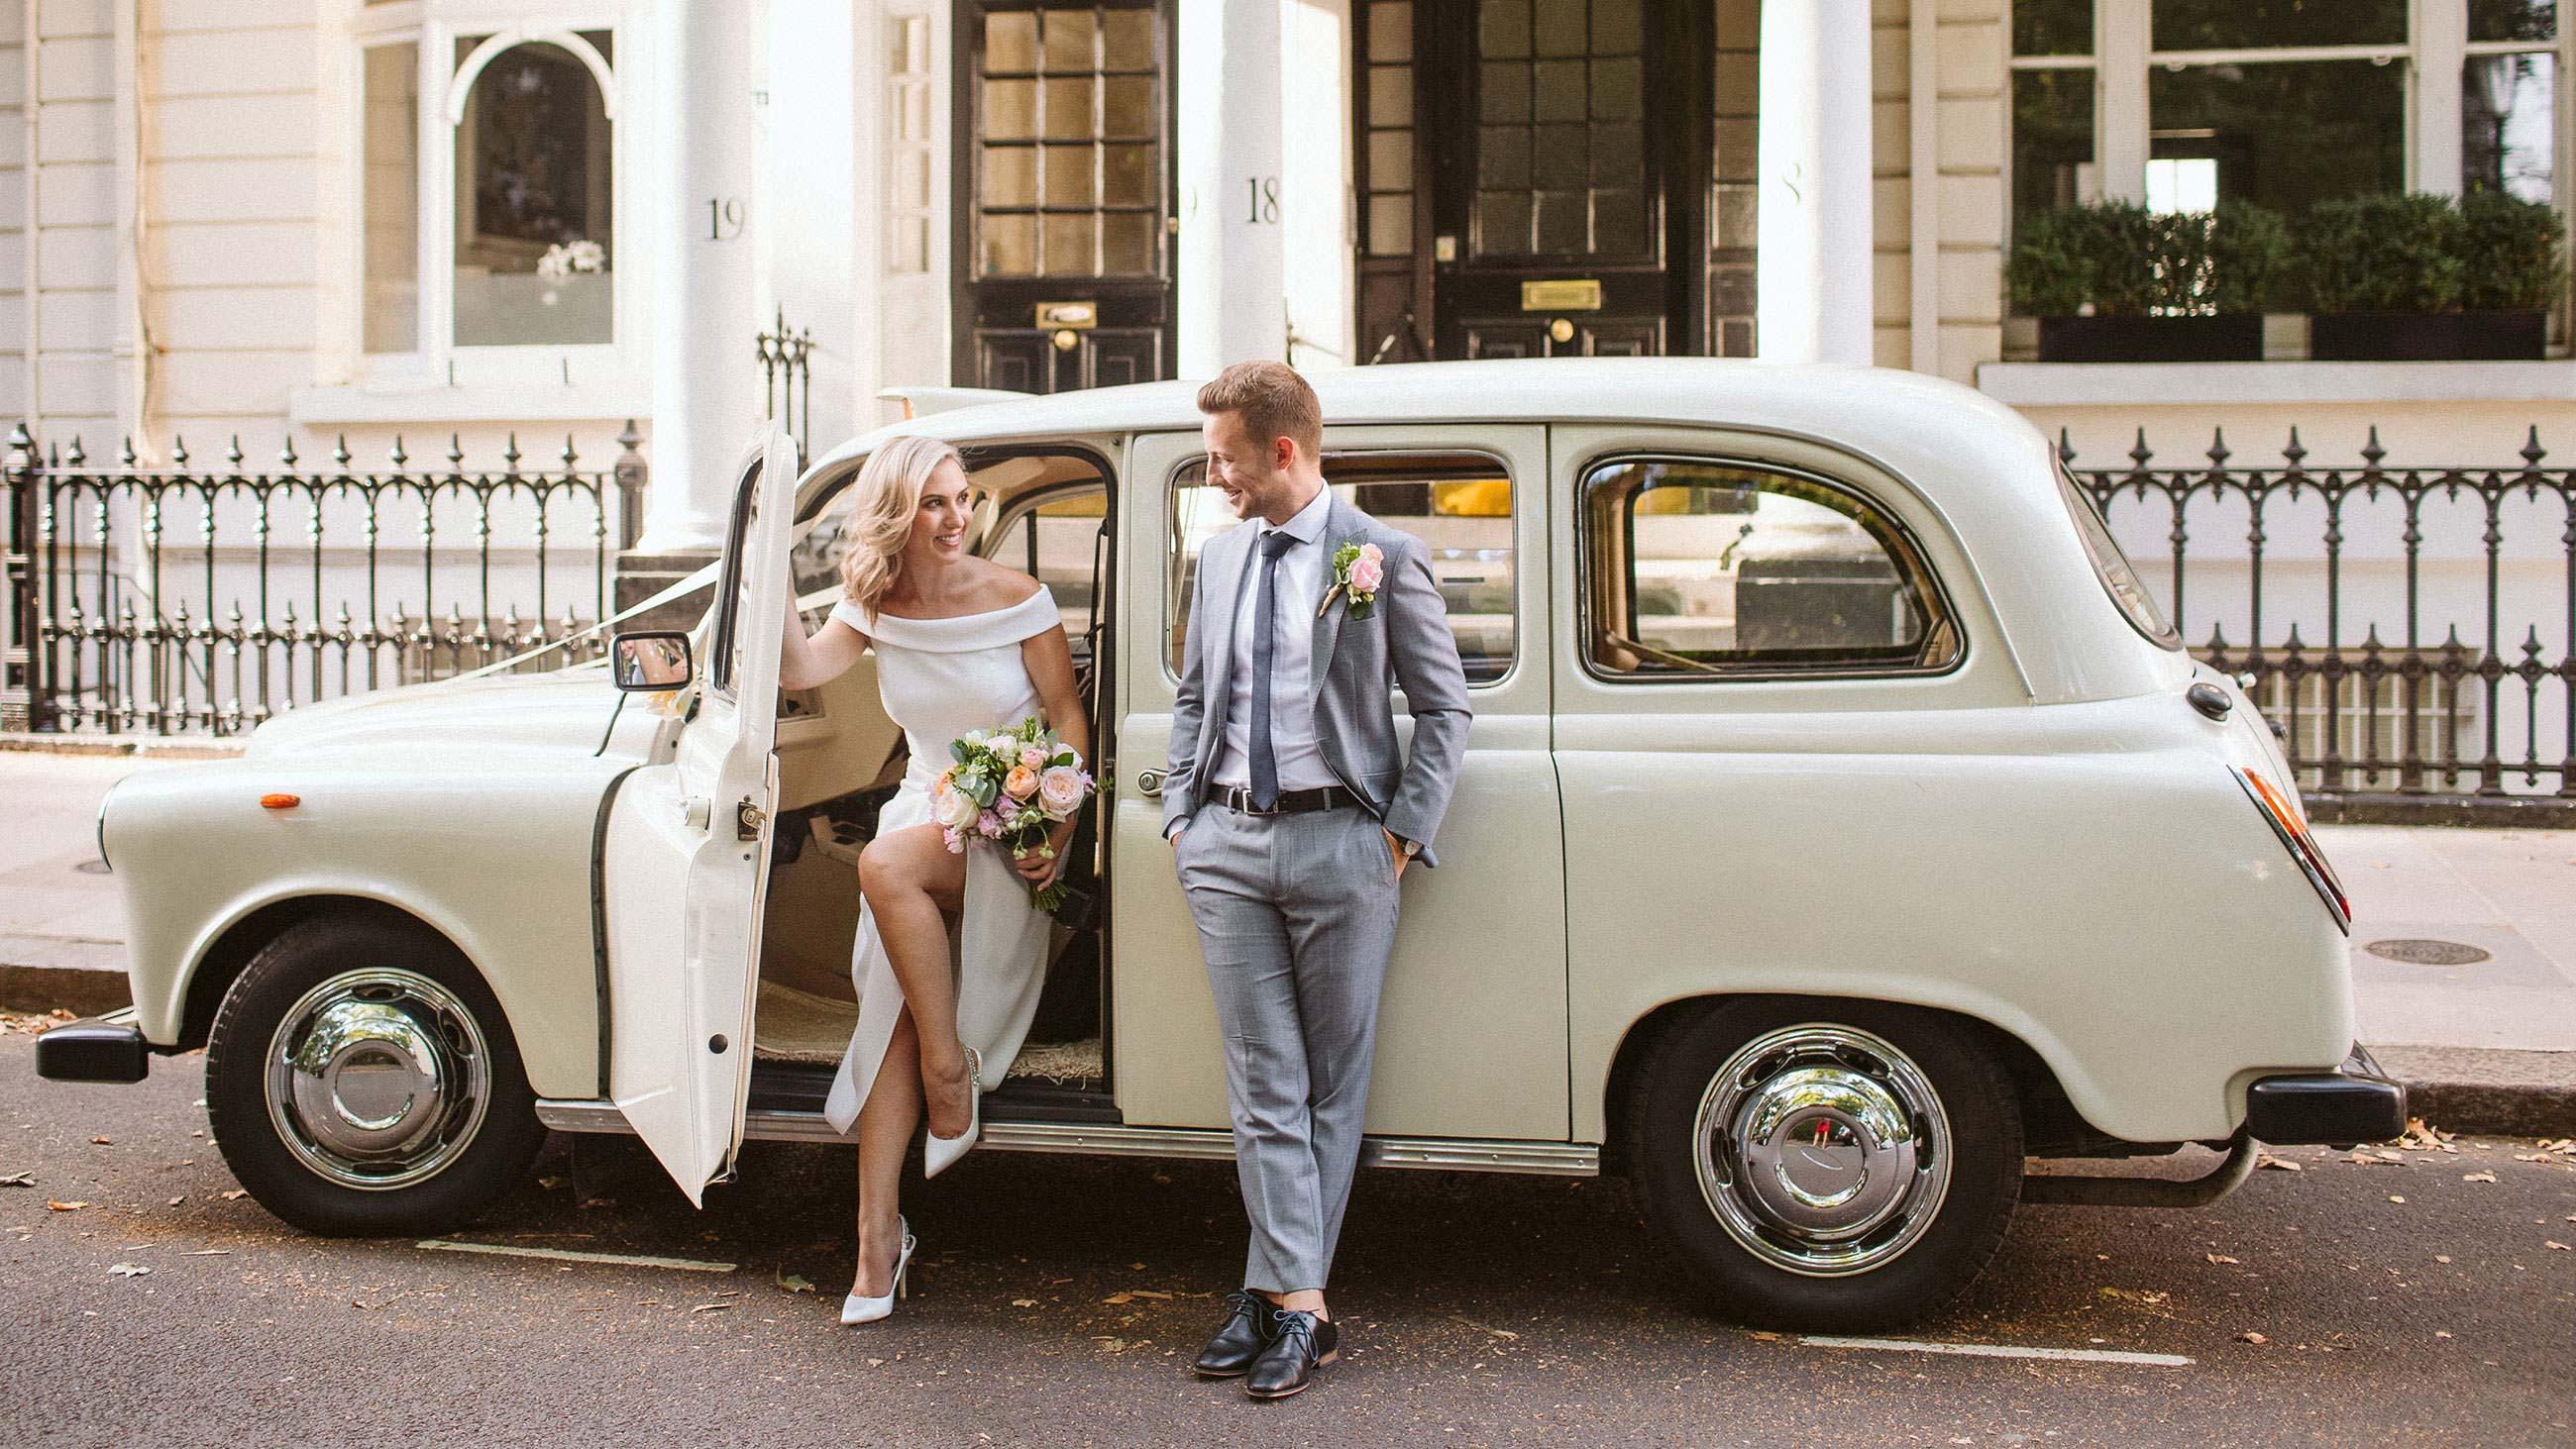 London Based Destination Wedding Photographer